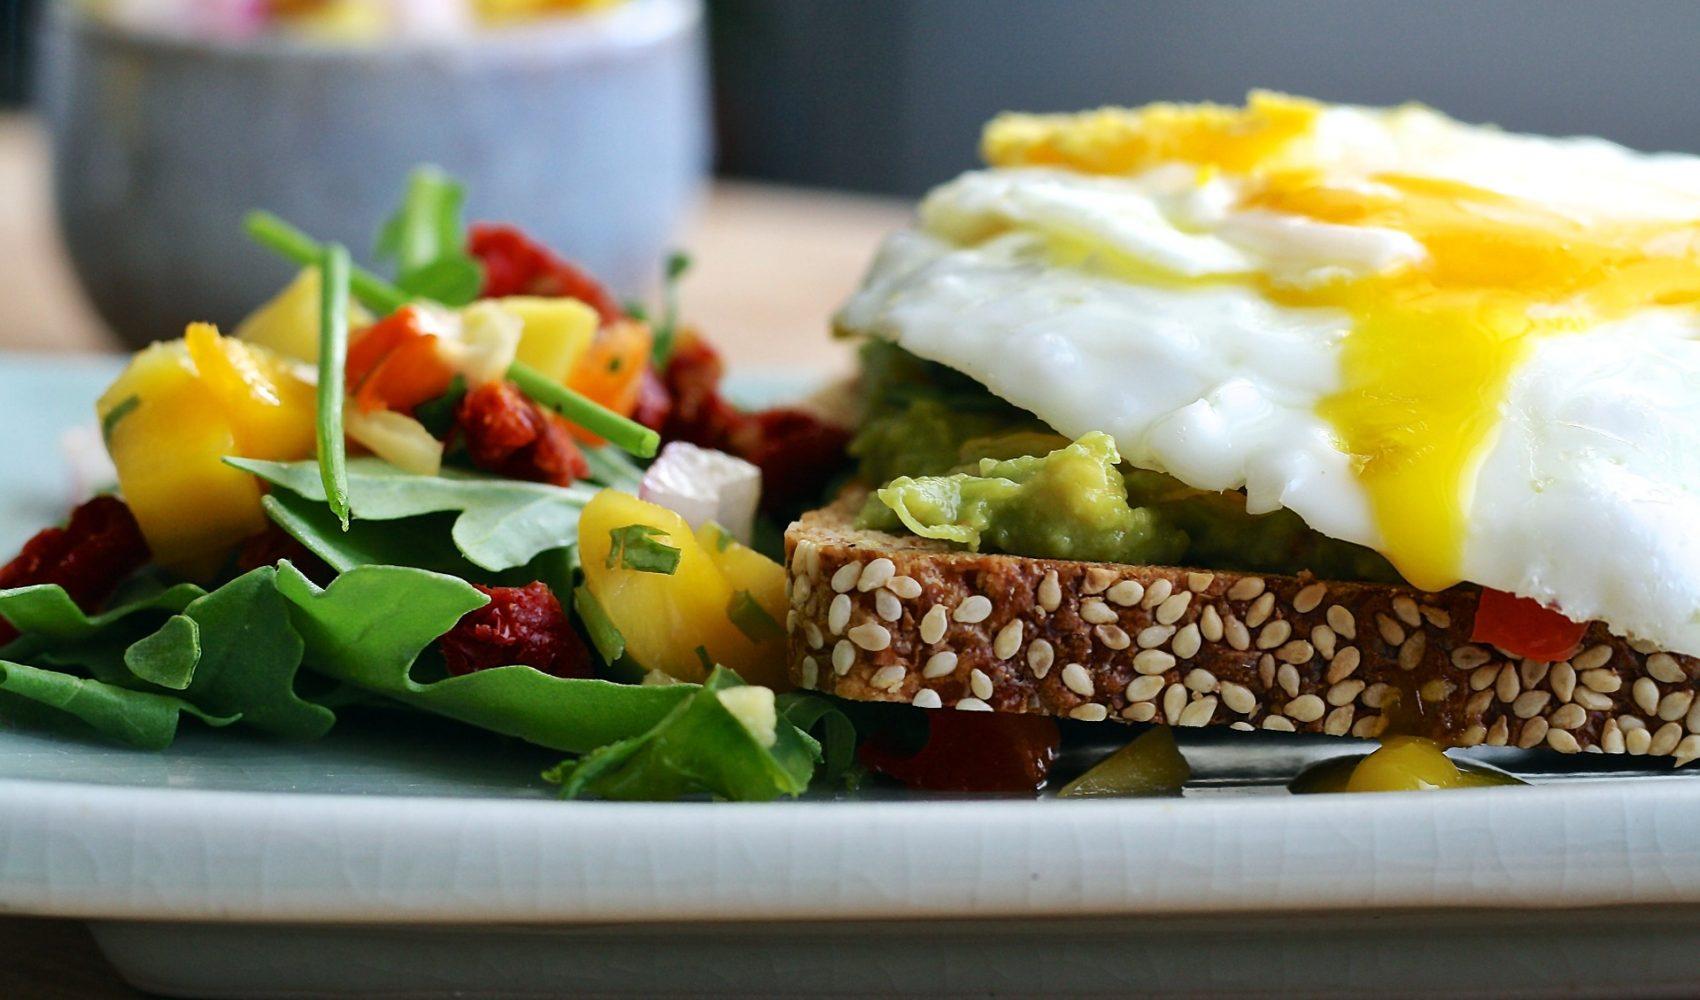 comida saludable sevilla